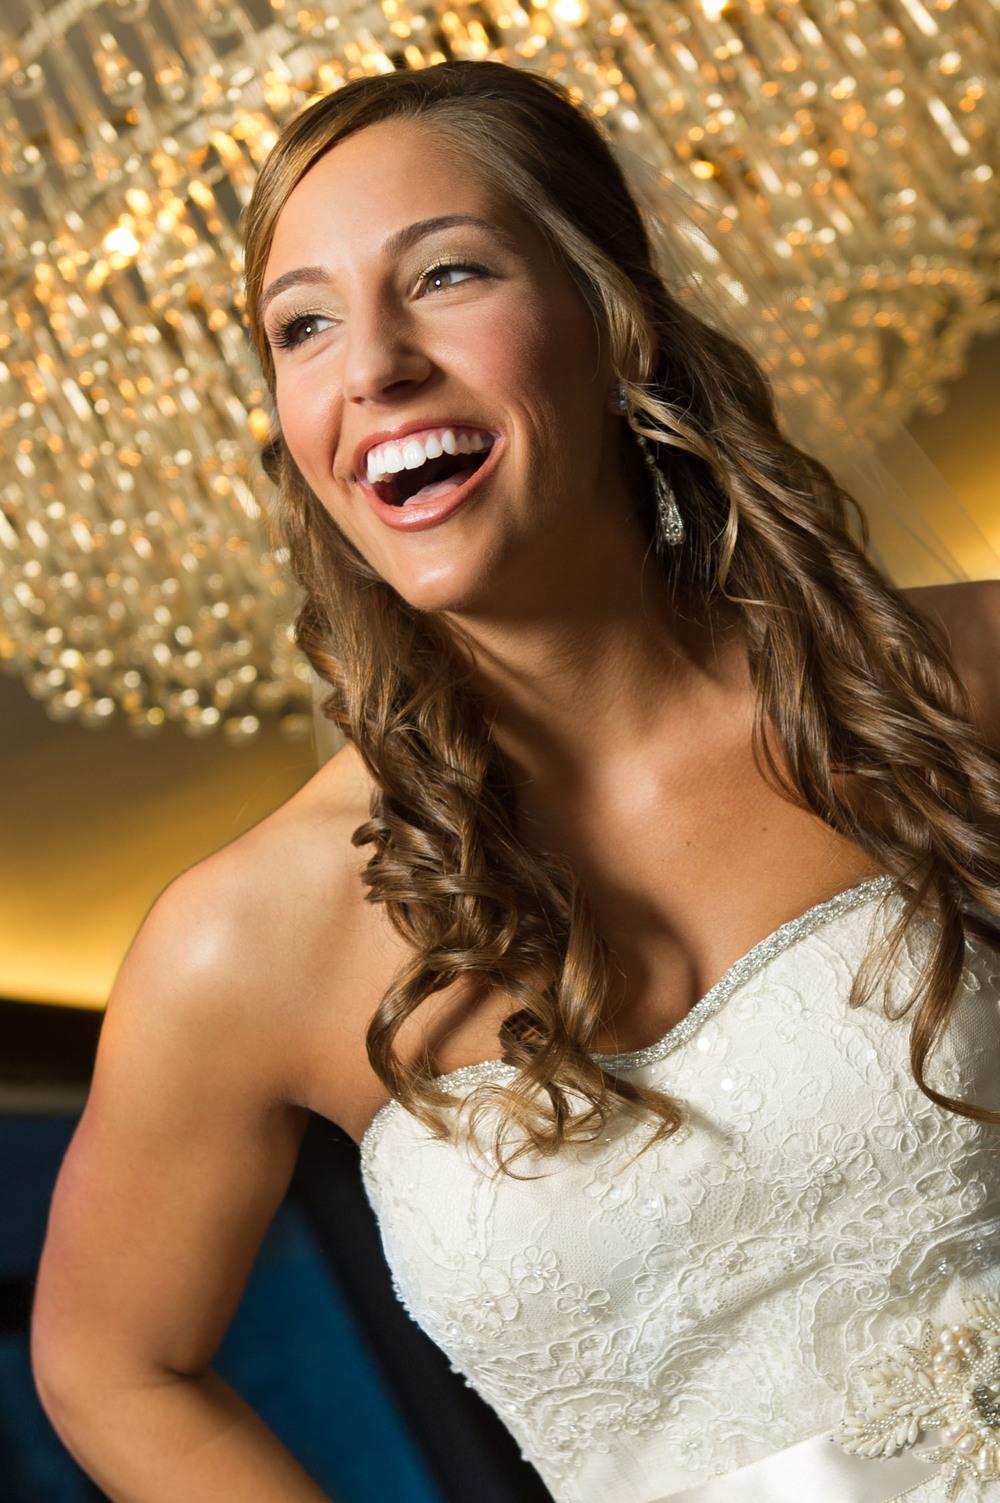 stewart_bertrand_wedding_photography_mawedblogwed-1030.jpg